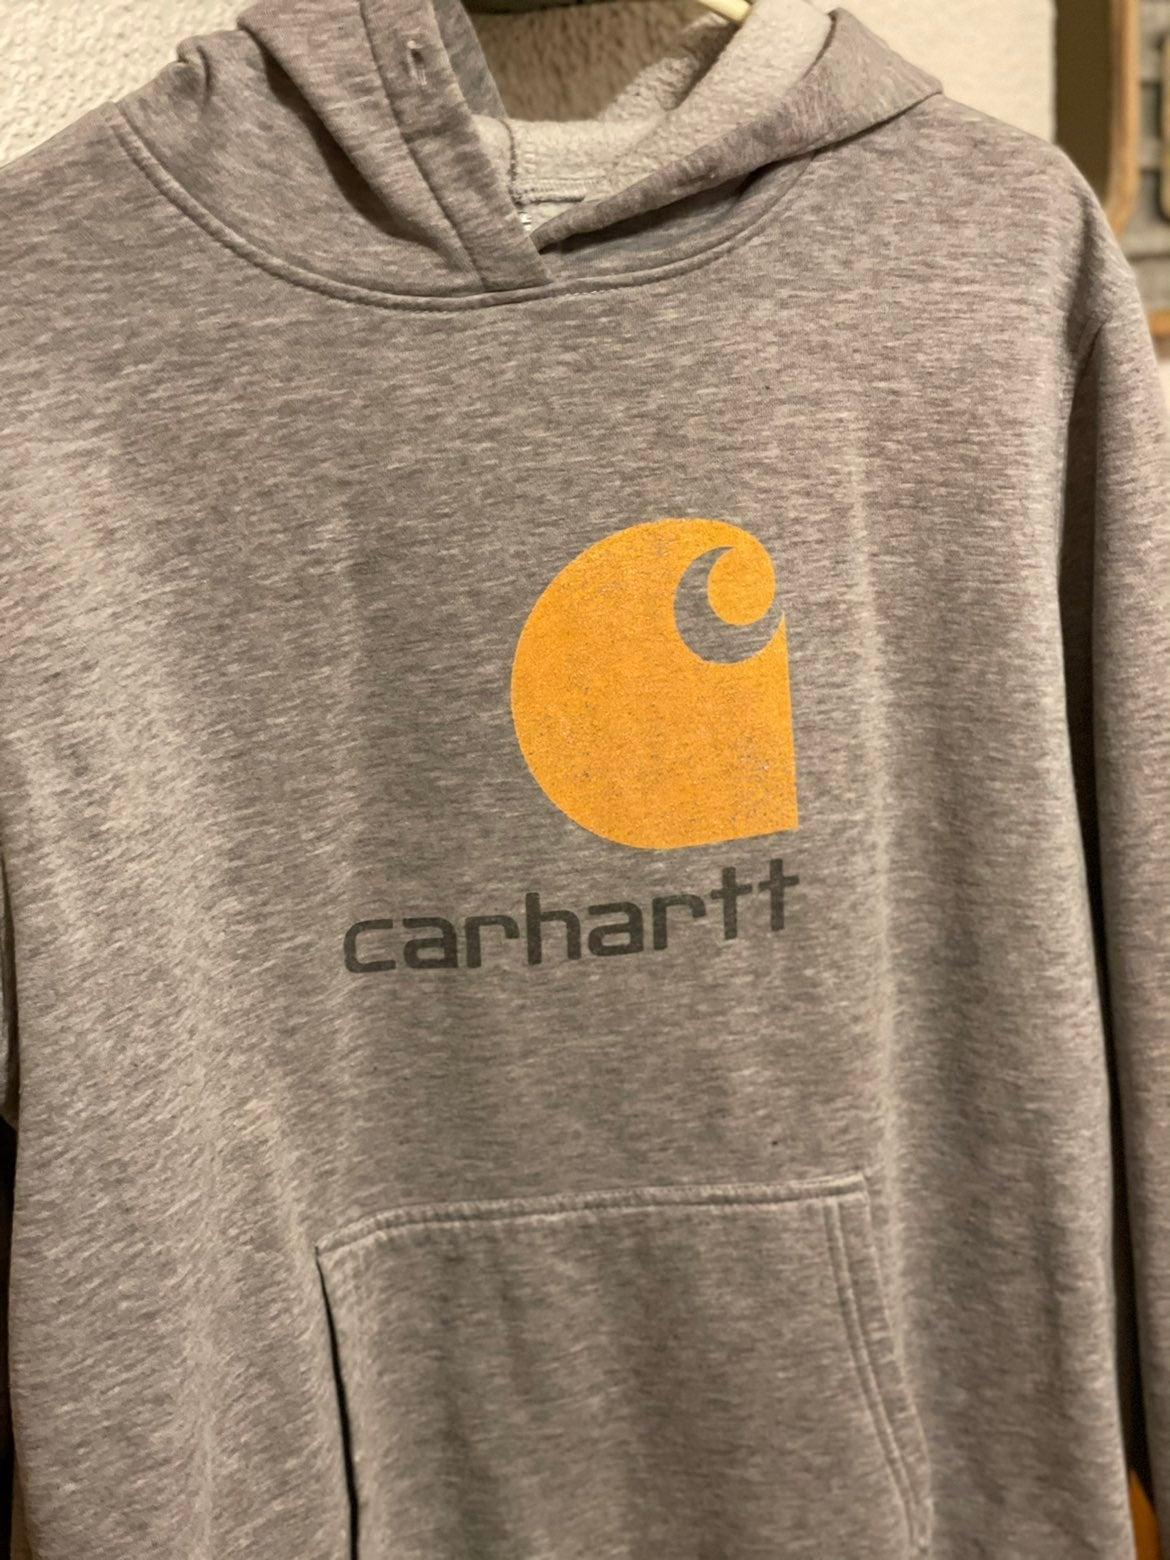 Ladies Carhartt sweatshirt